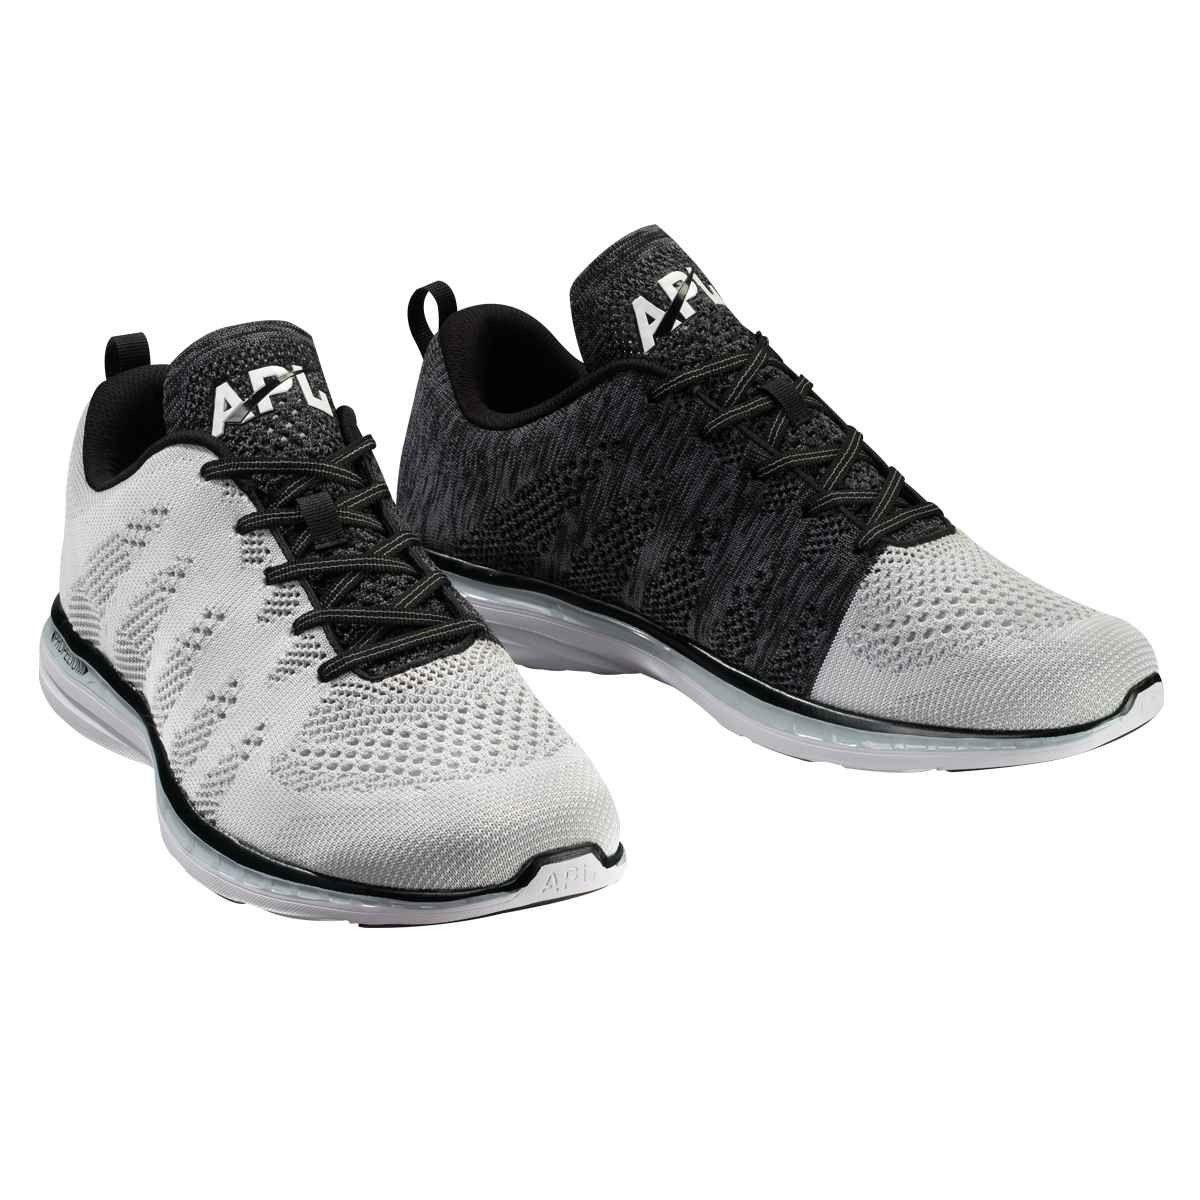 apl women's black sneakers